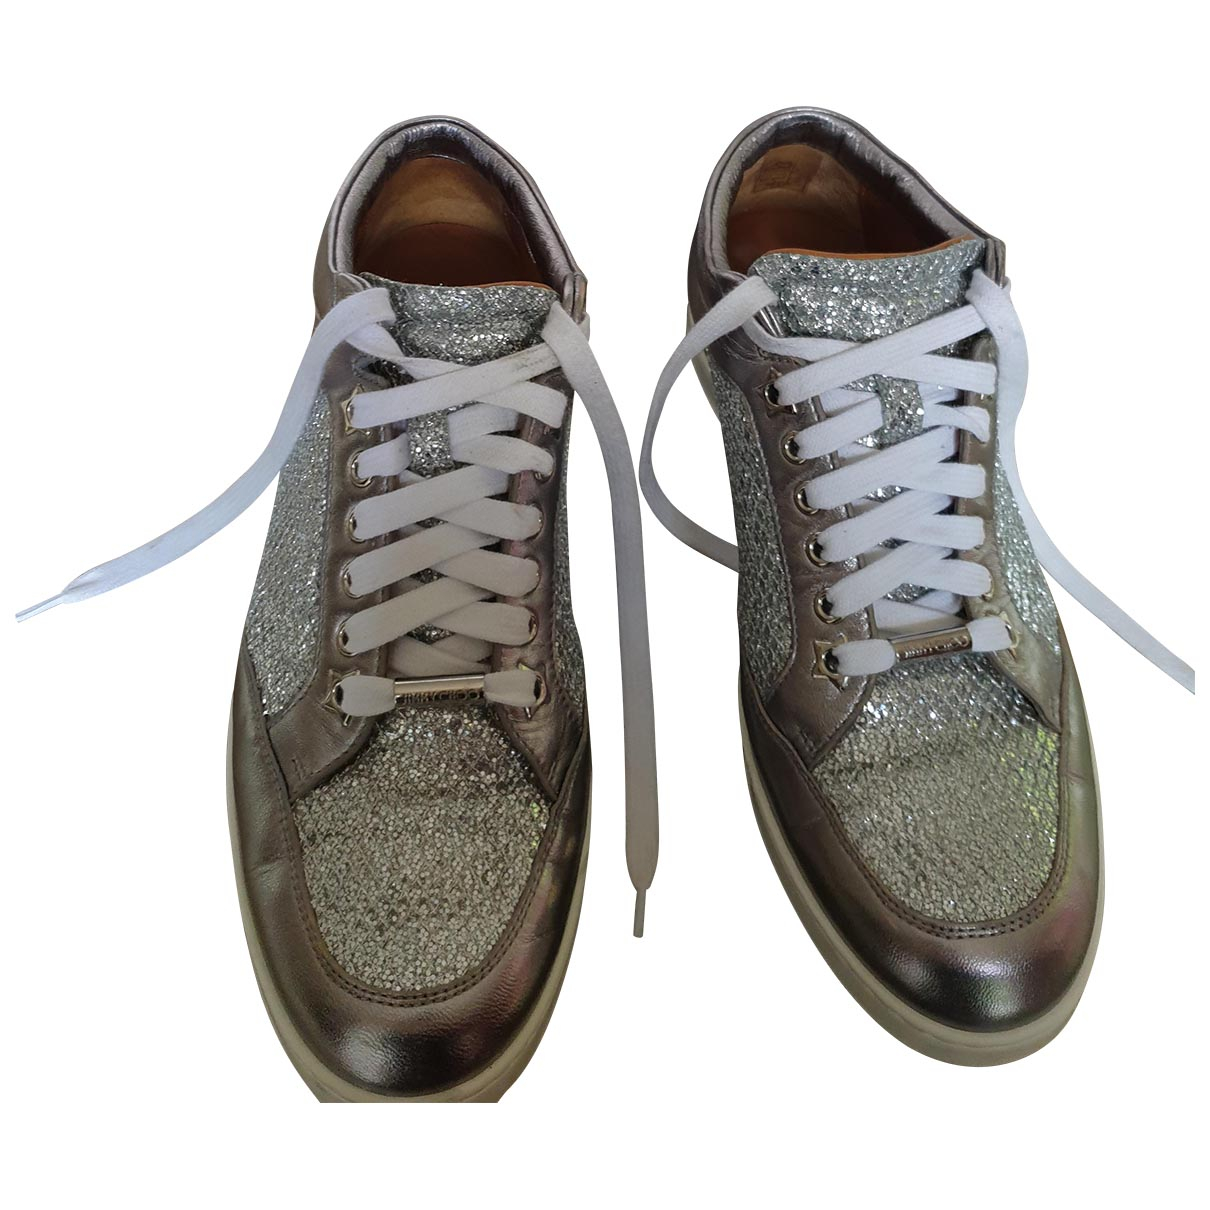 Jimmy Choo \N Silver Leather Trainers for Women 37.5 EU